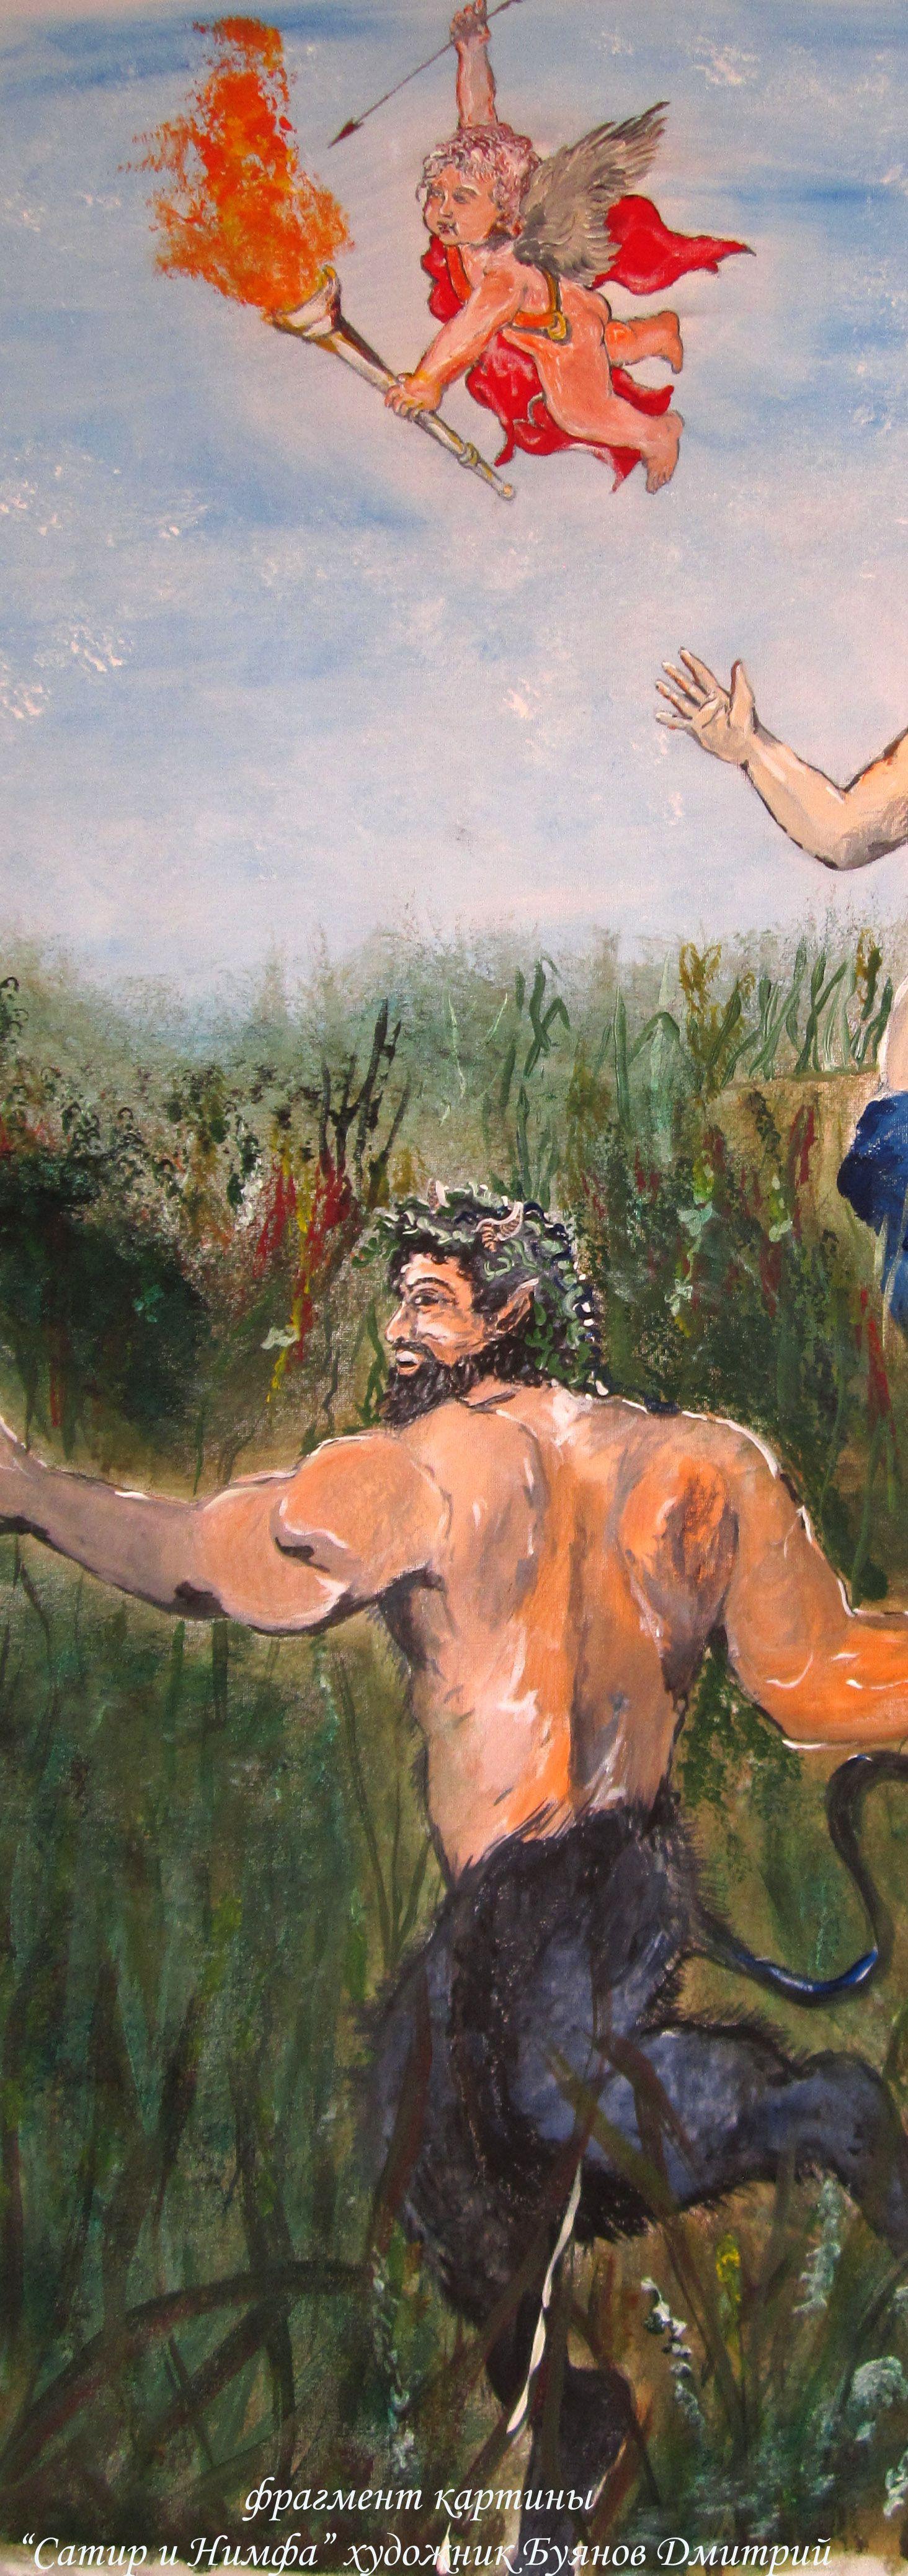 "Дмитрий Юрьевич Буянов. A fragment of the painting ""Satyr and Nymph"""